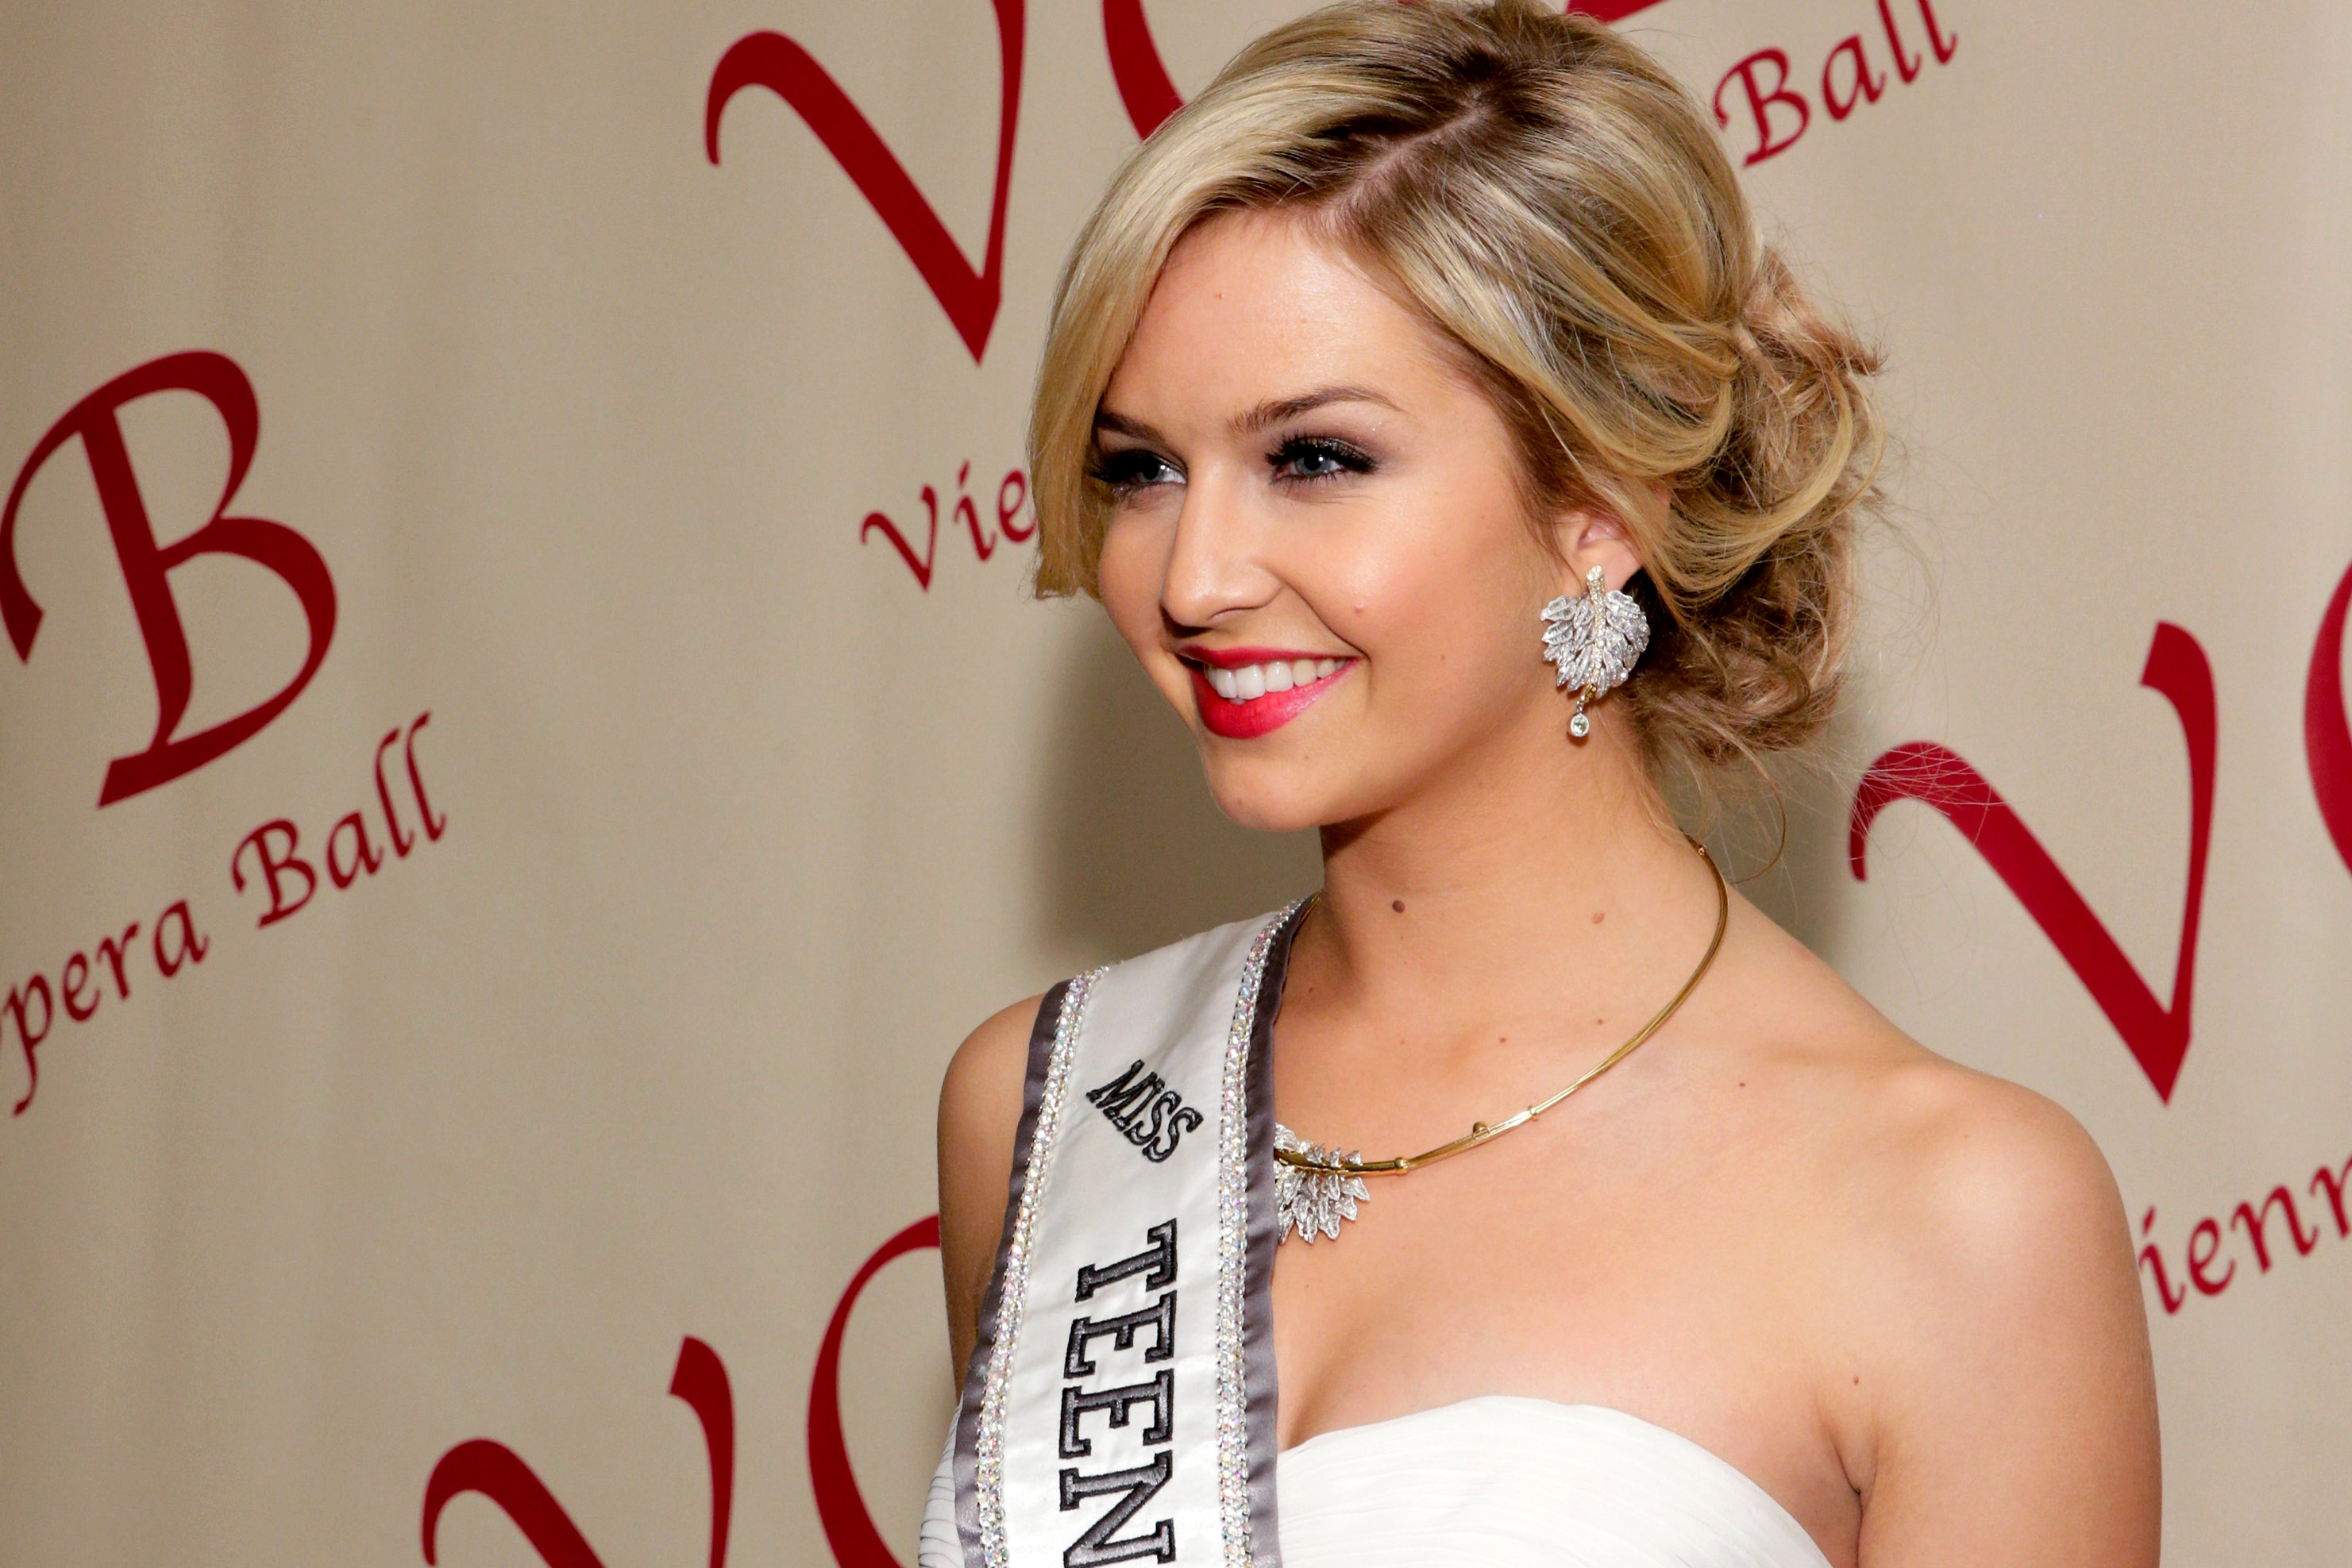 Eye For Beauty: Louisiana Wins Miss Teen USA 2015